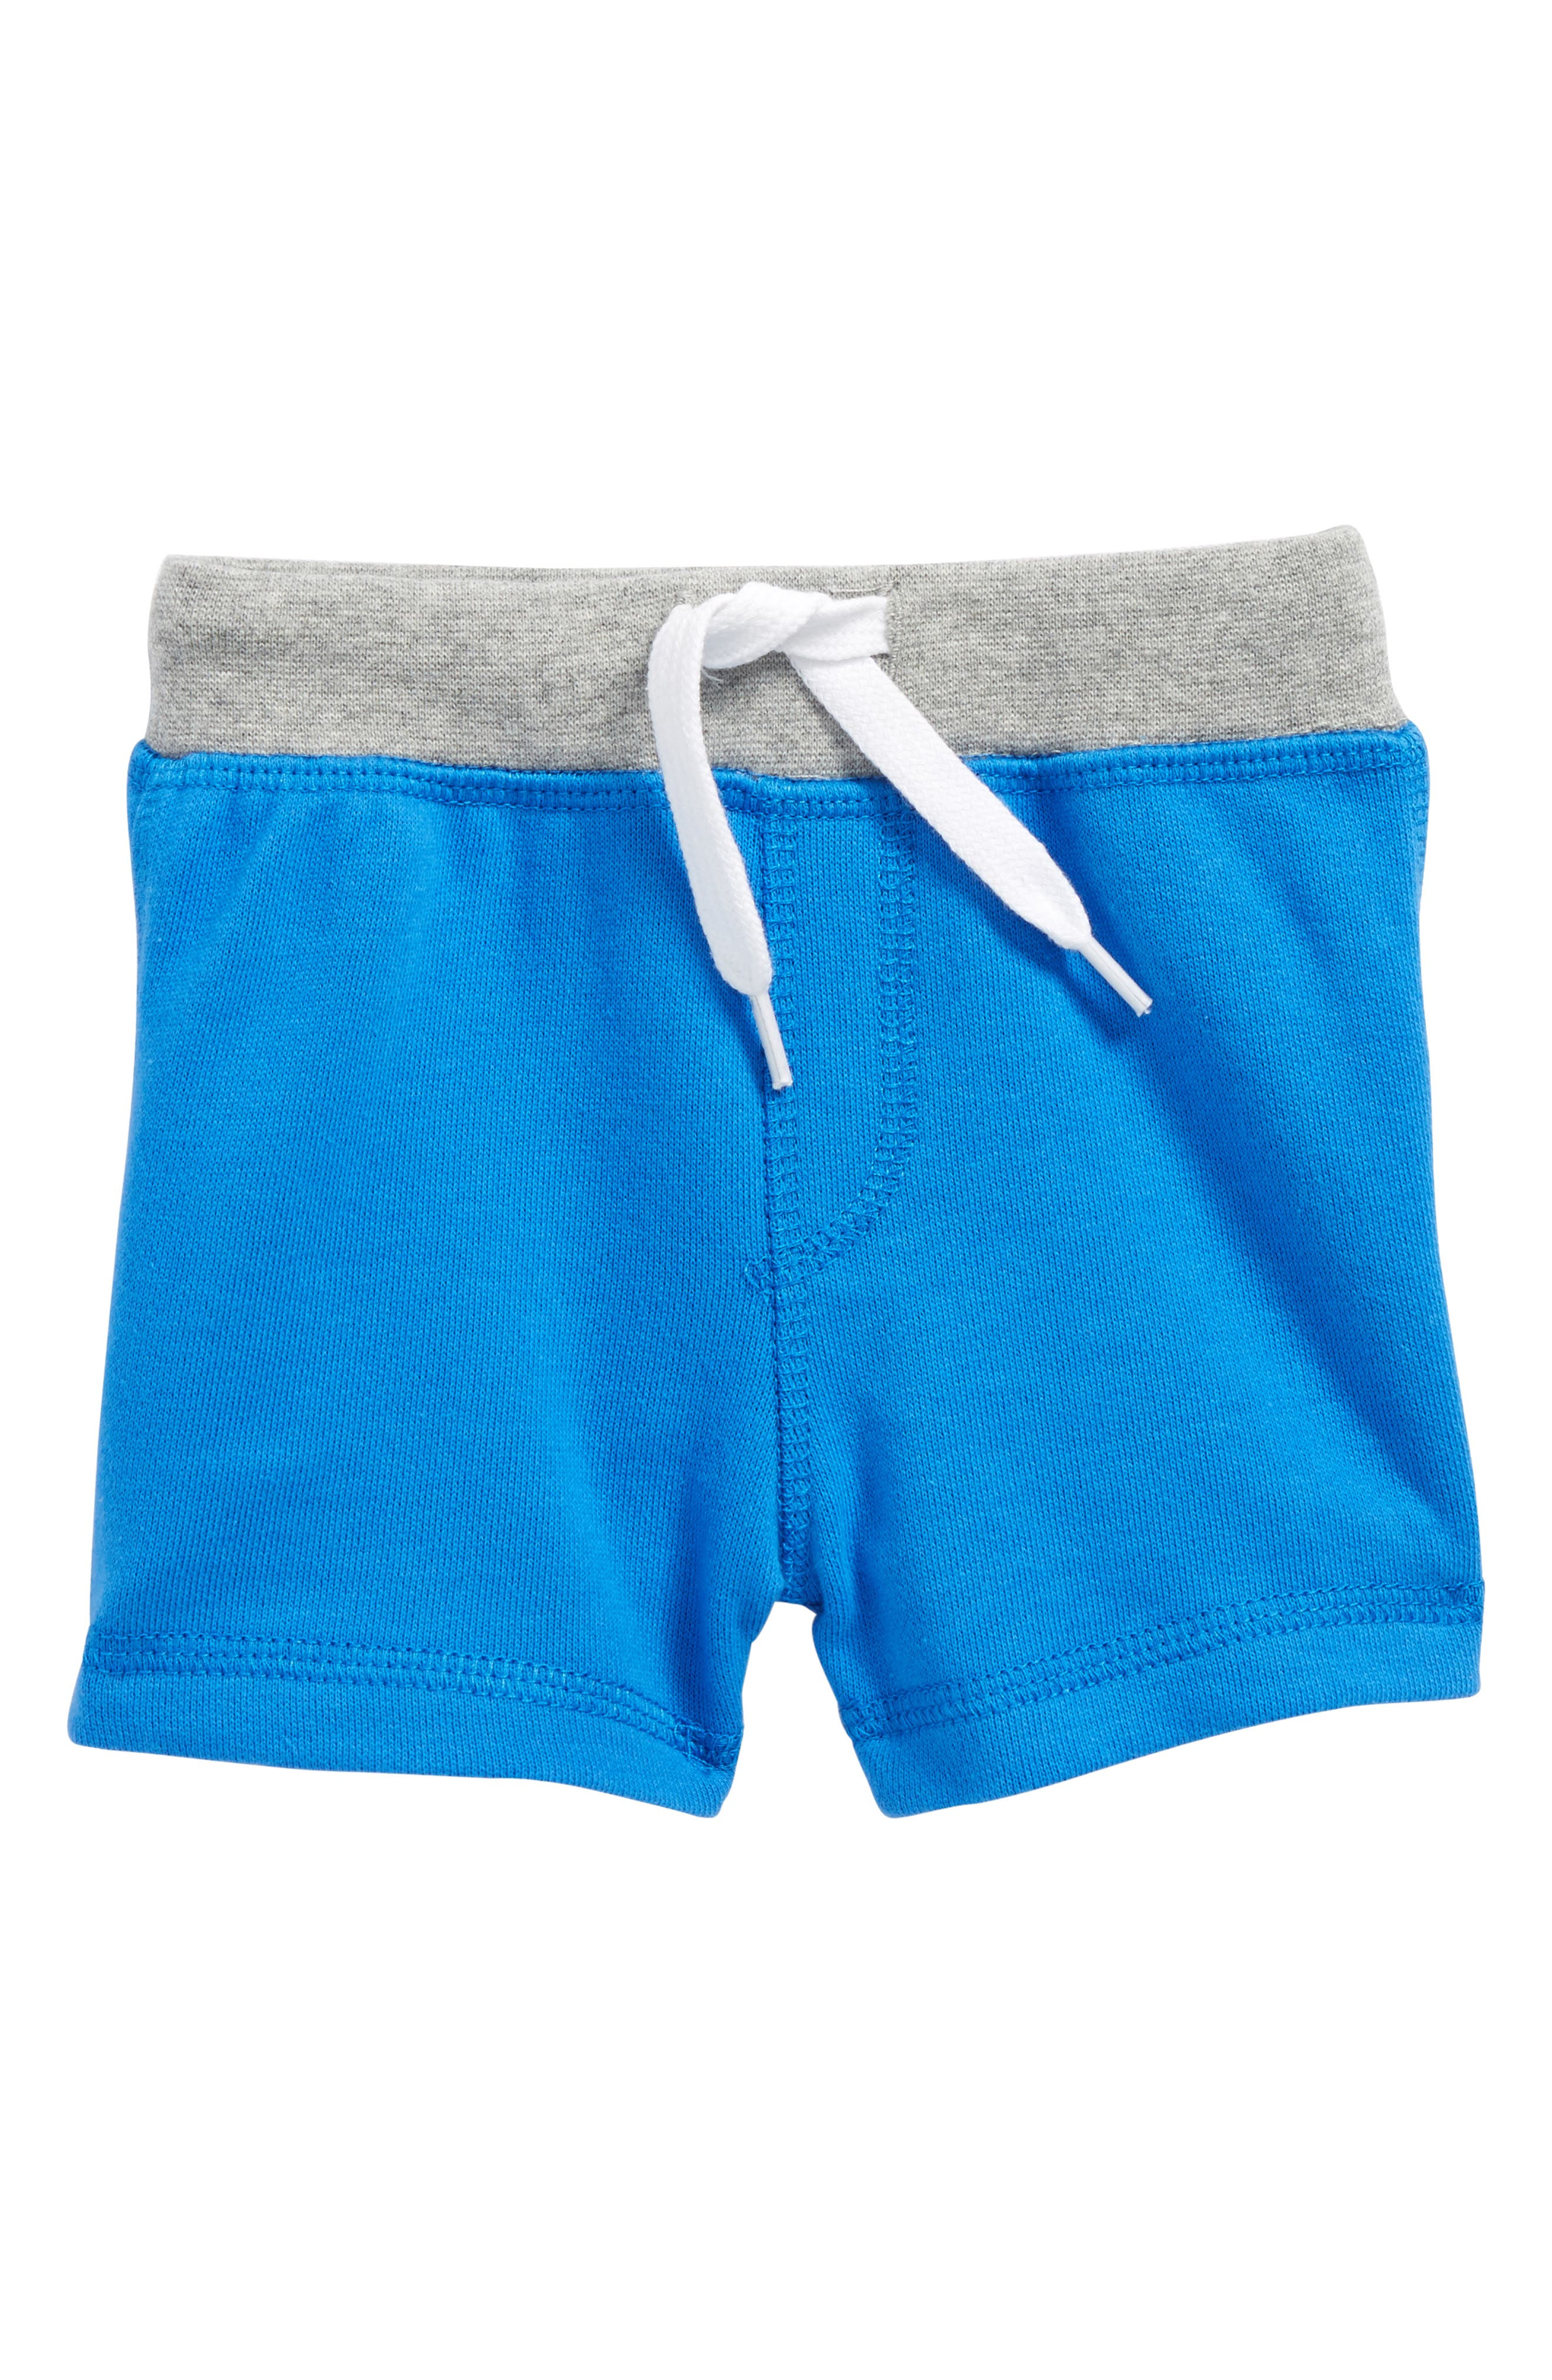 Pull On Shorts,                             Main thumbnail 1, color,                             Blue Lolite